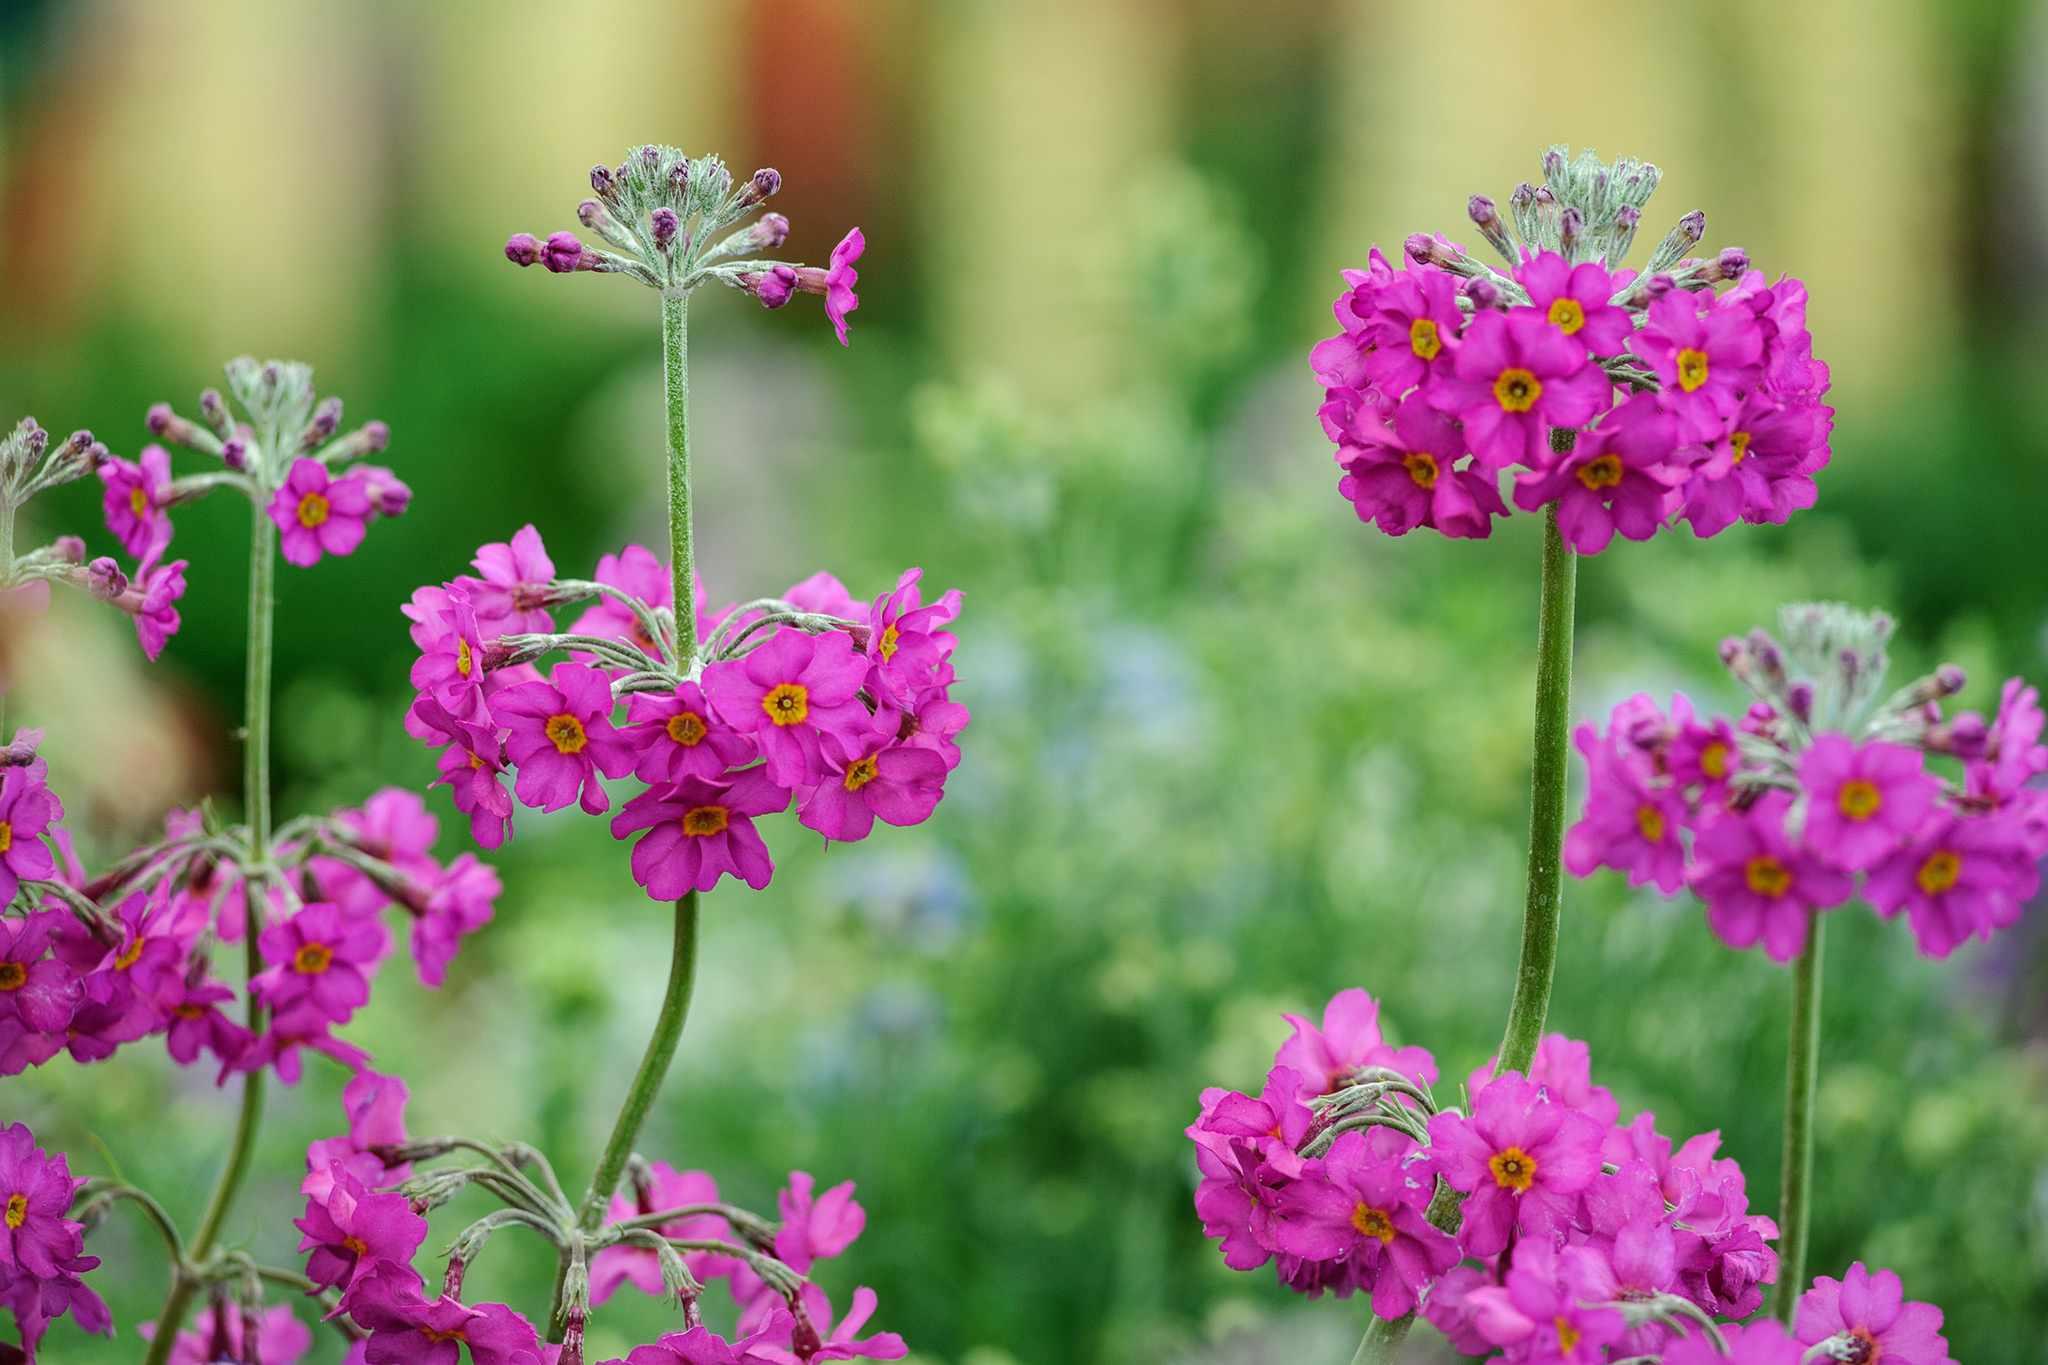 Candelabra primula flowers